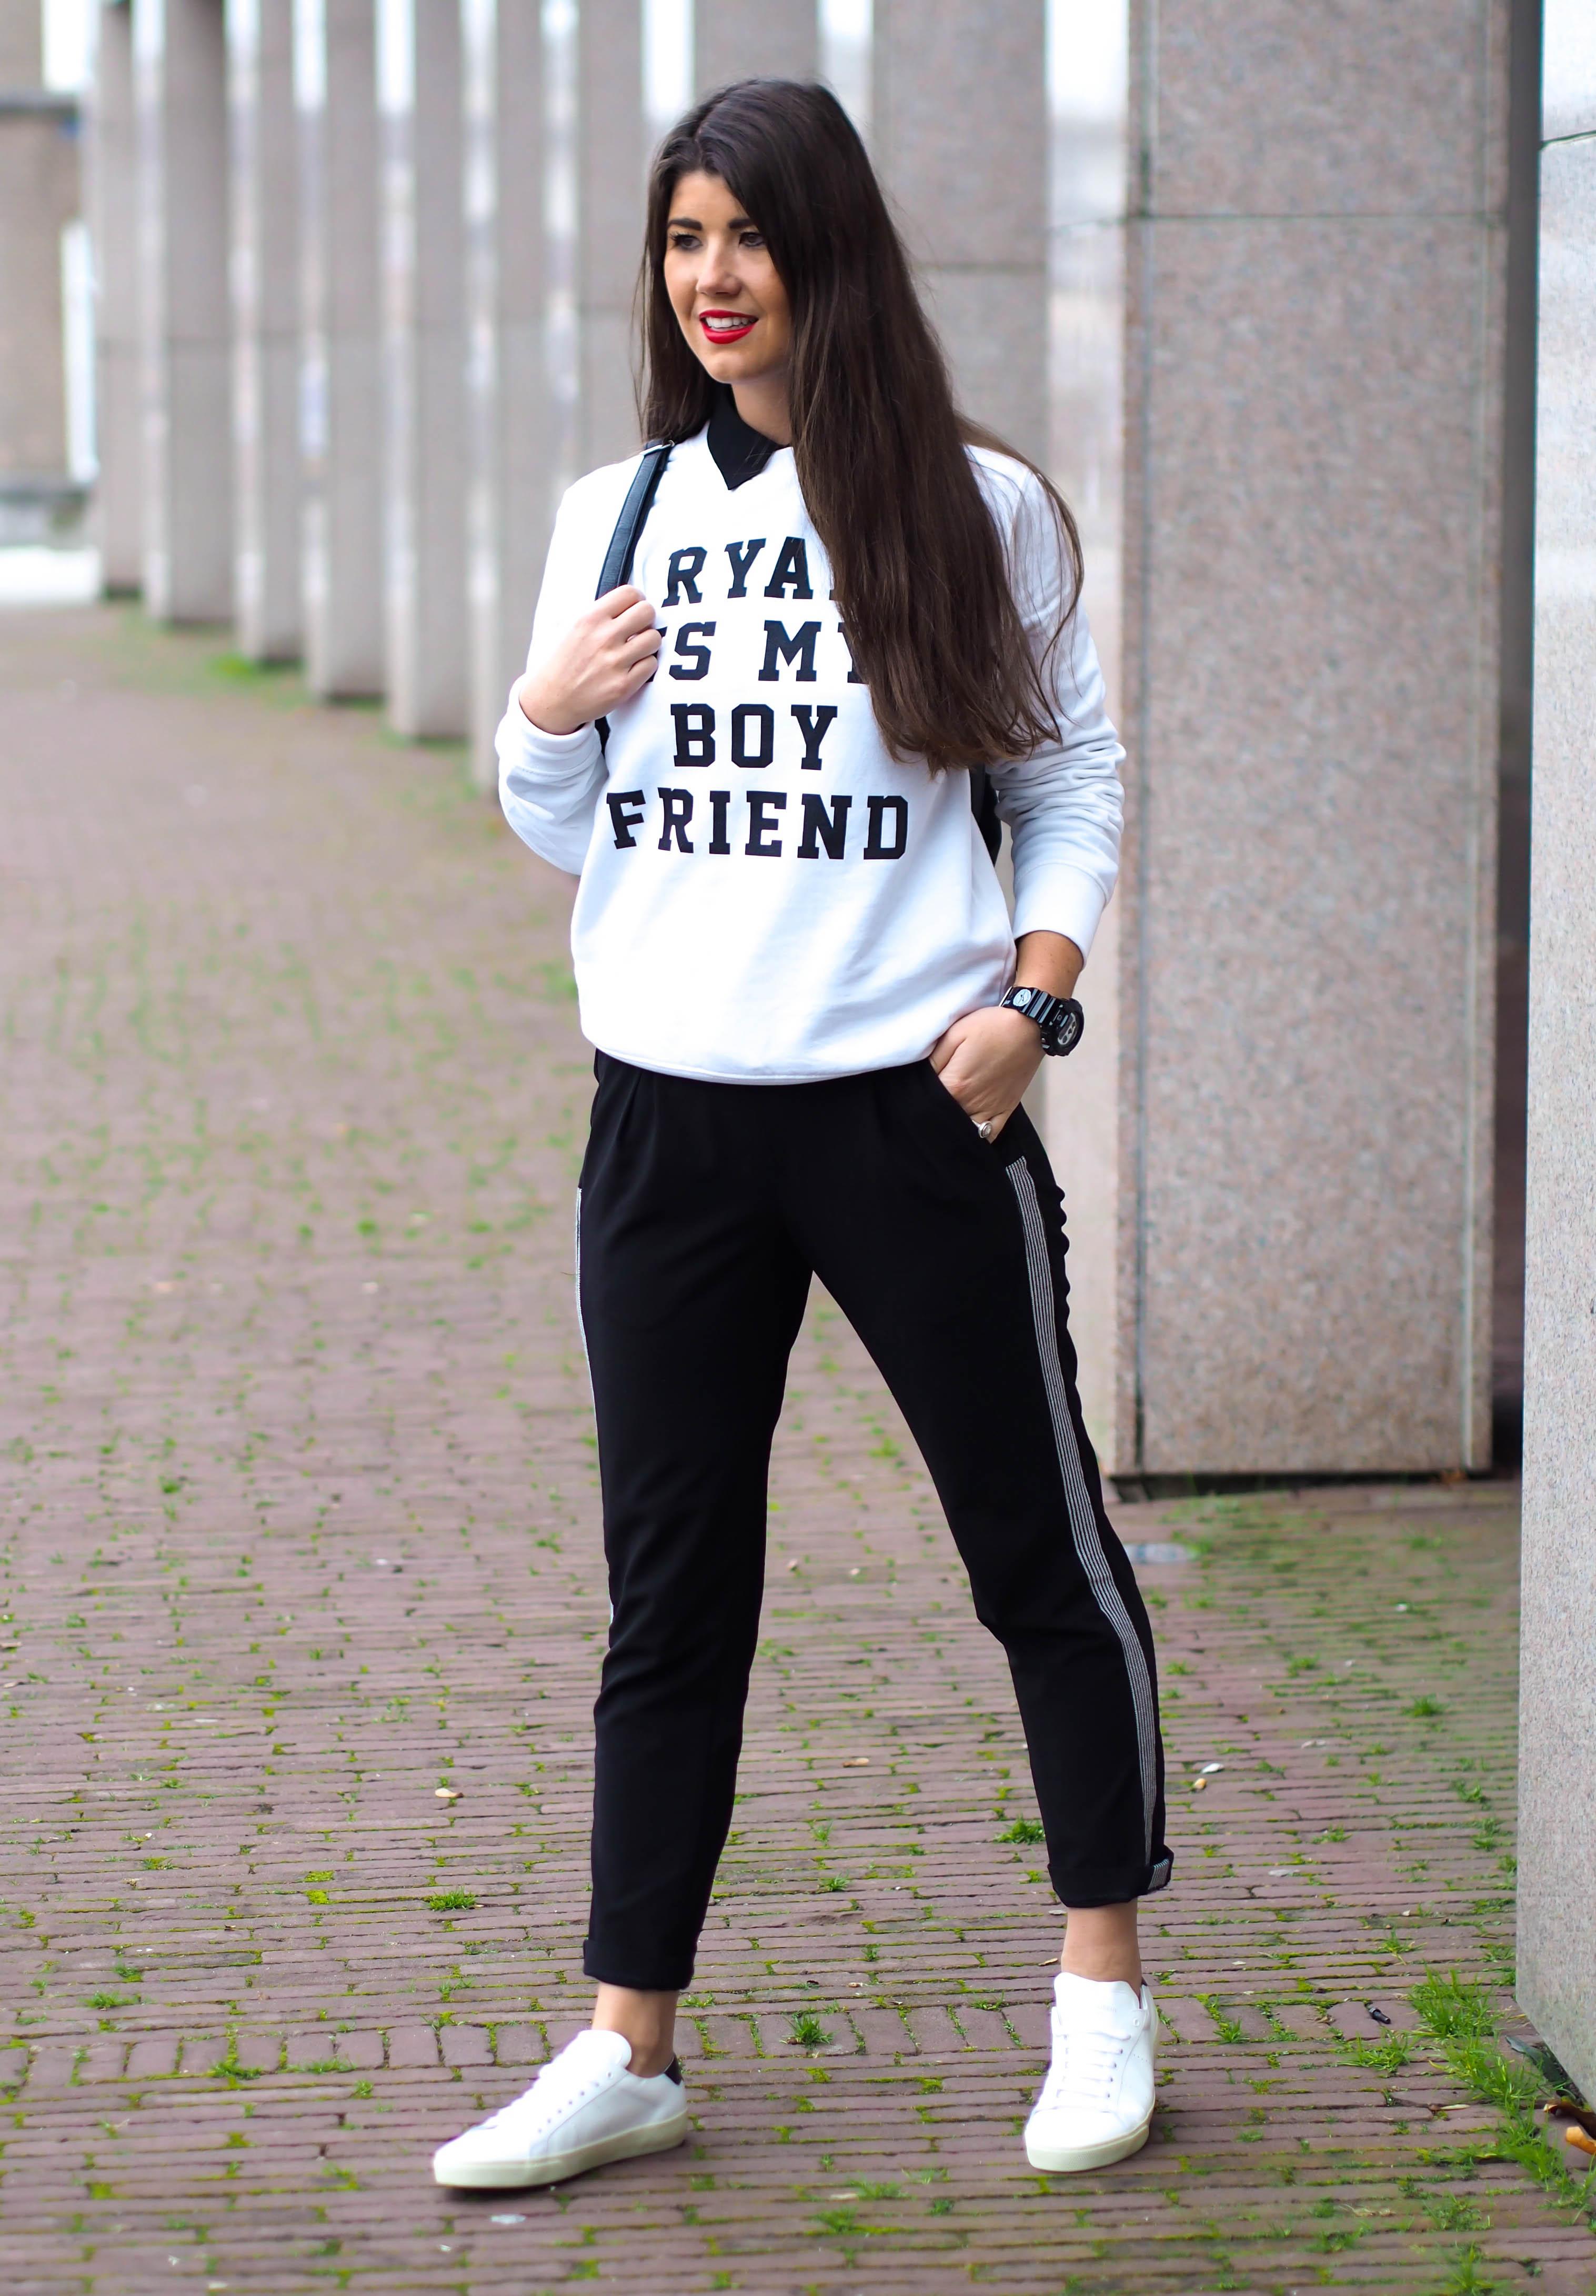 fashionista chloe fashionblogger 2014